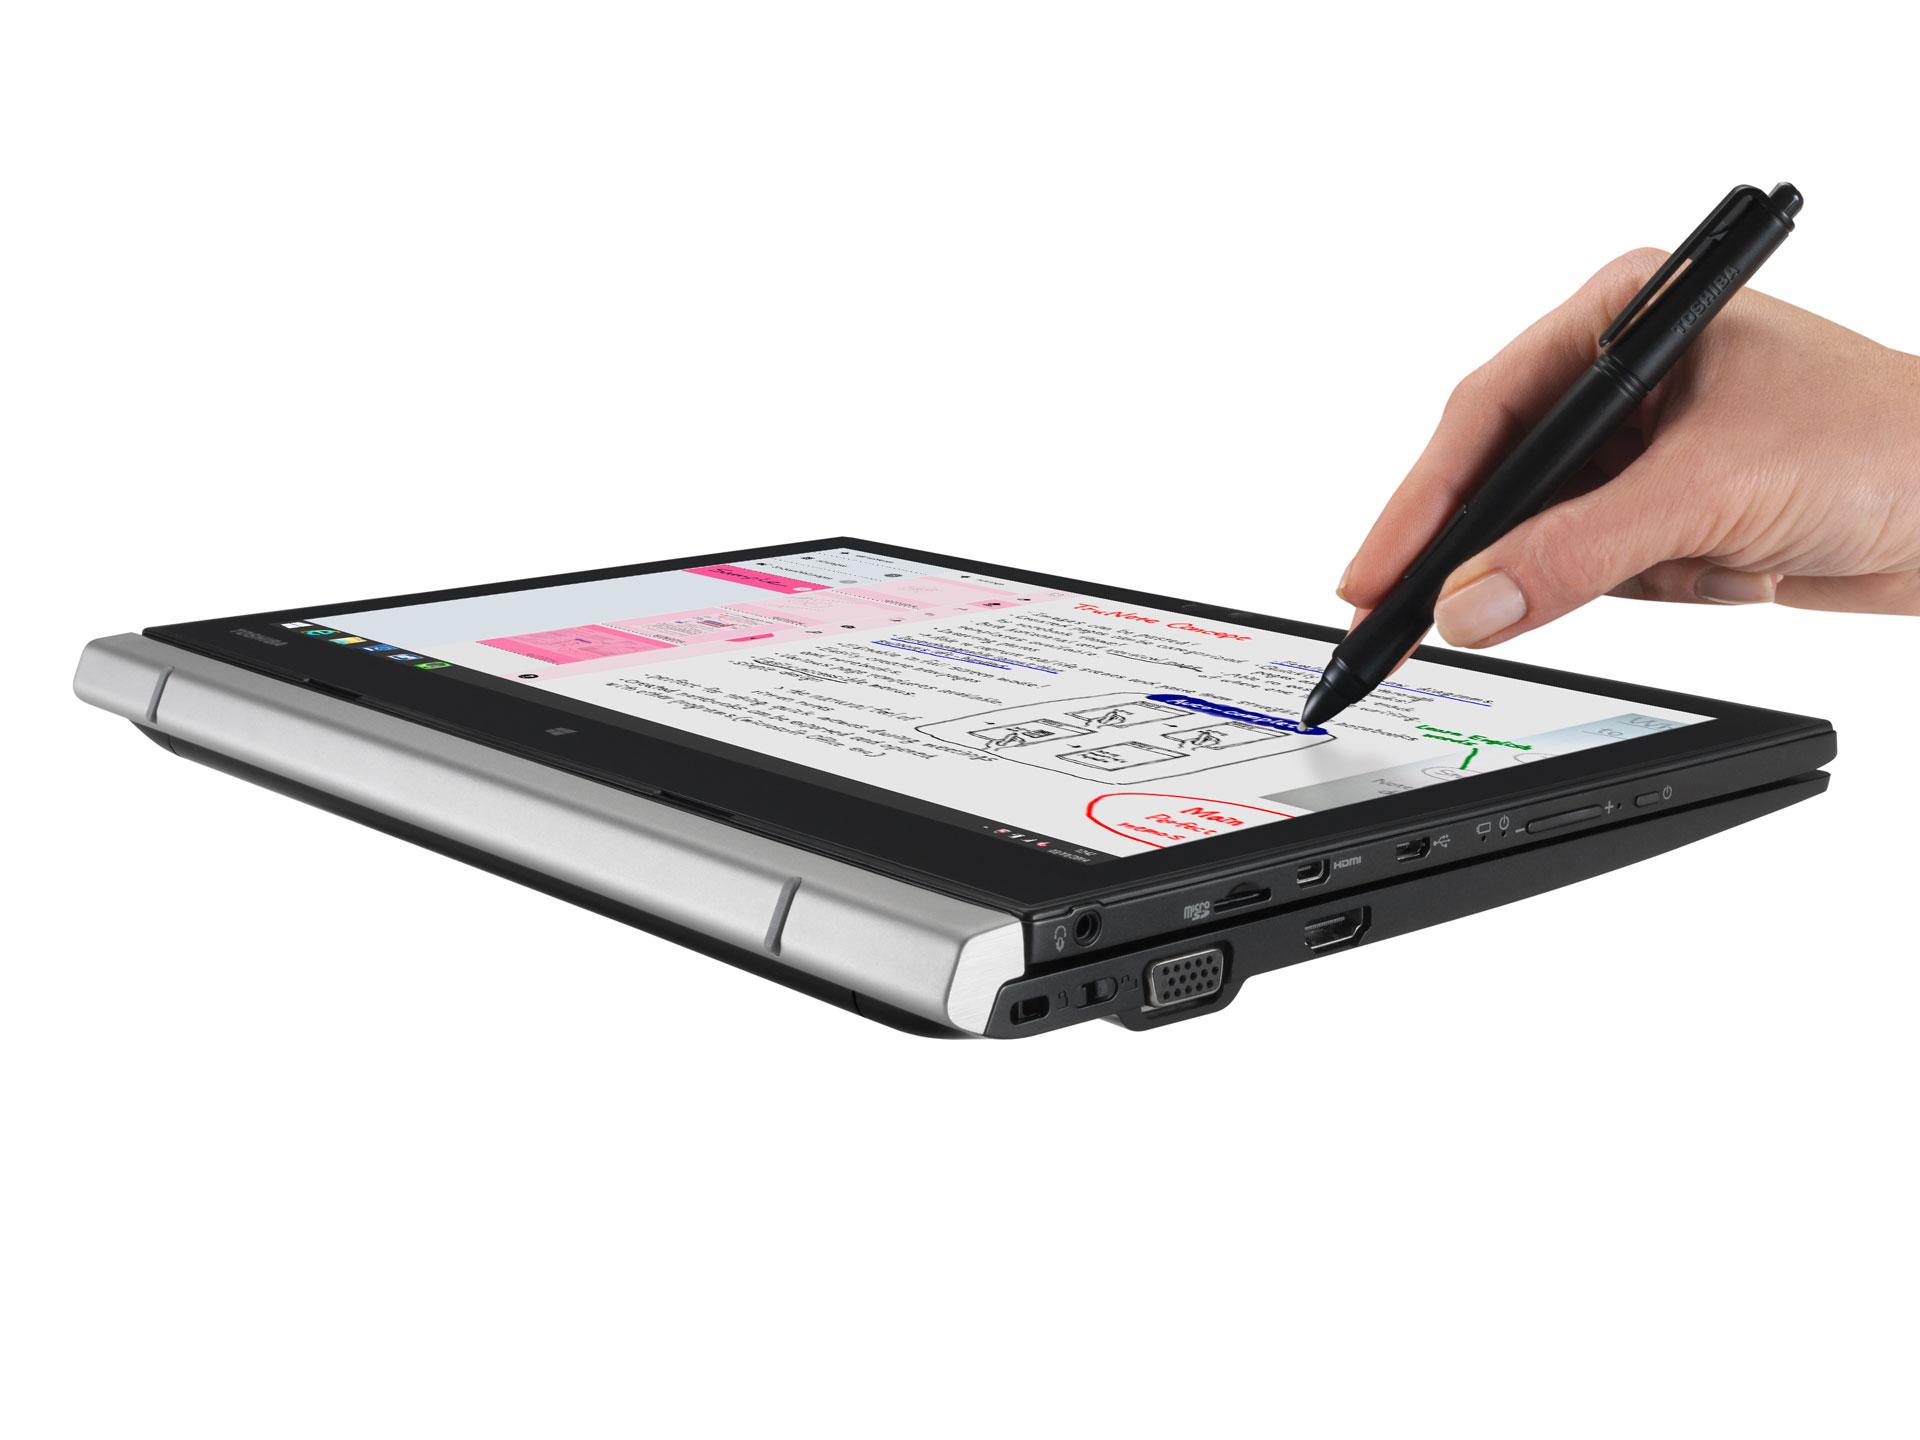 port g z20t neues ultrabook aus dem hause toshiba allround. Black Bedroom Furniture Sets. Home Design Ideas